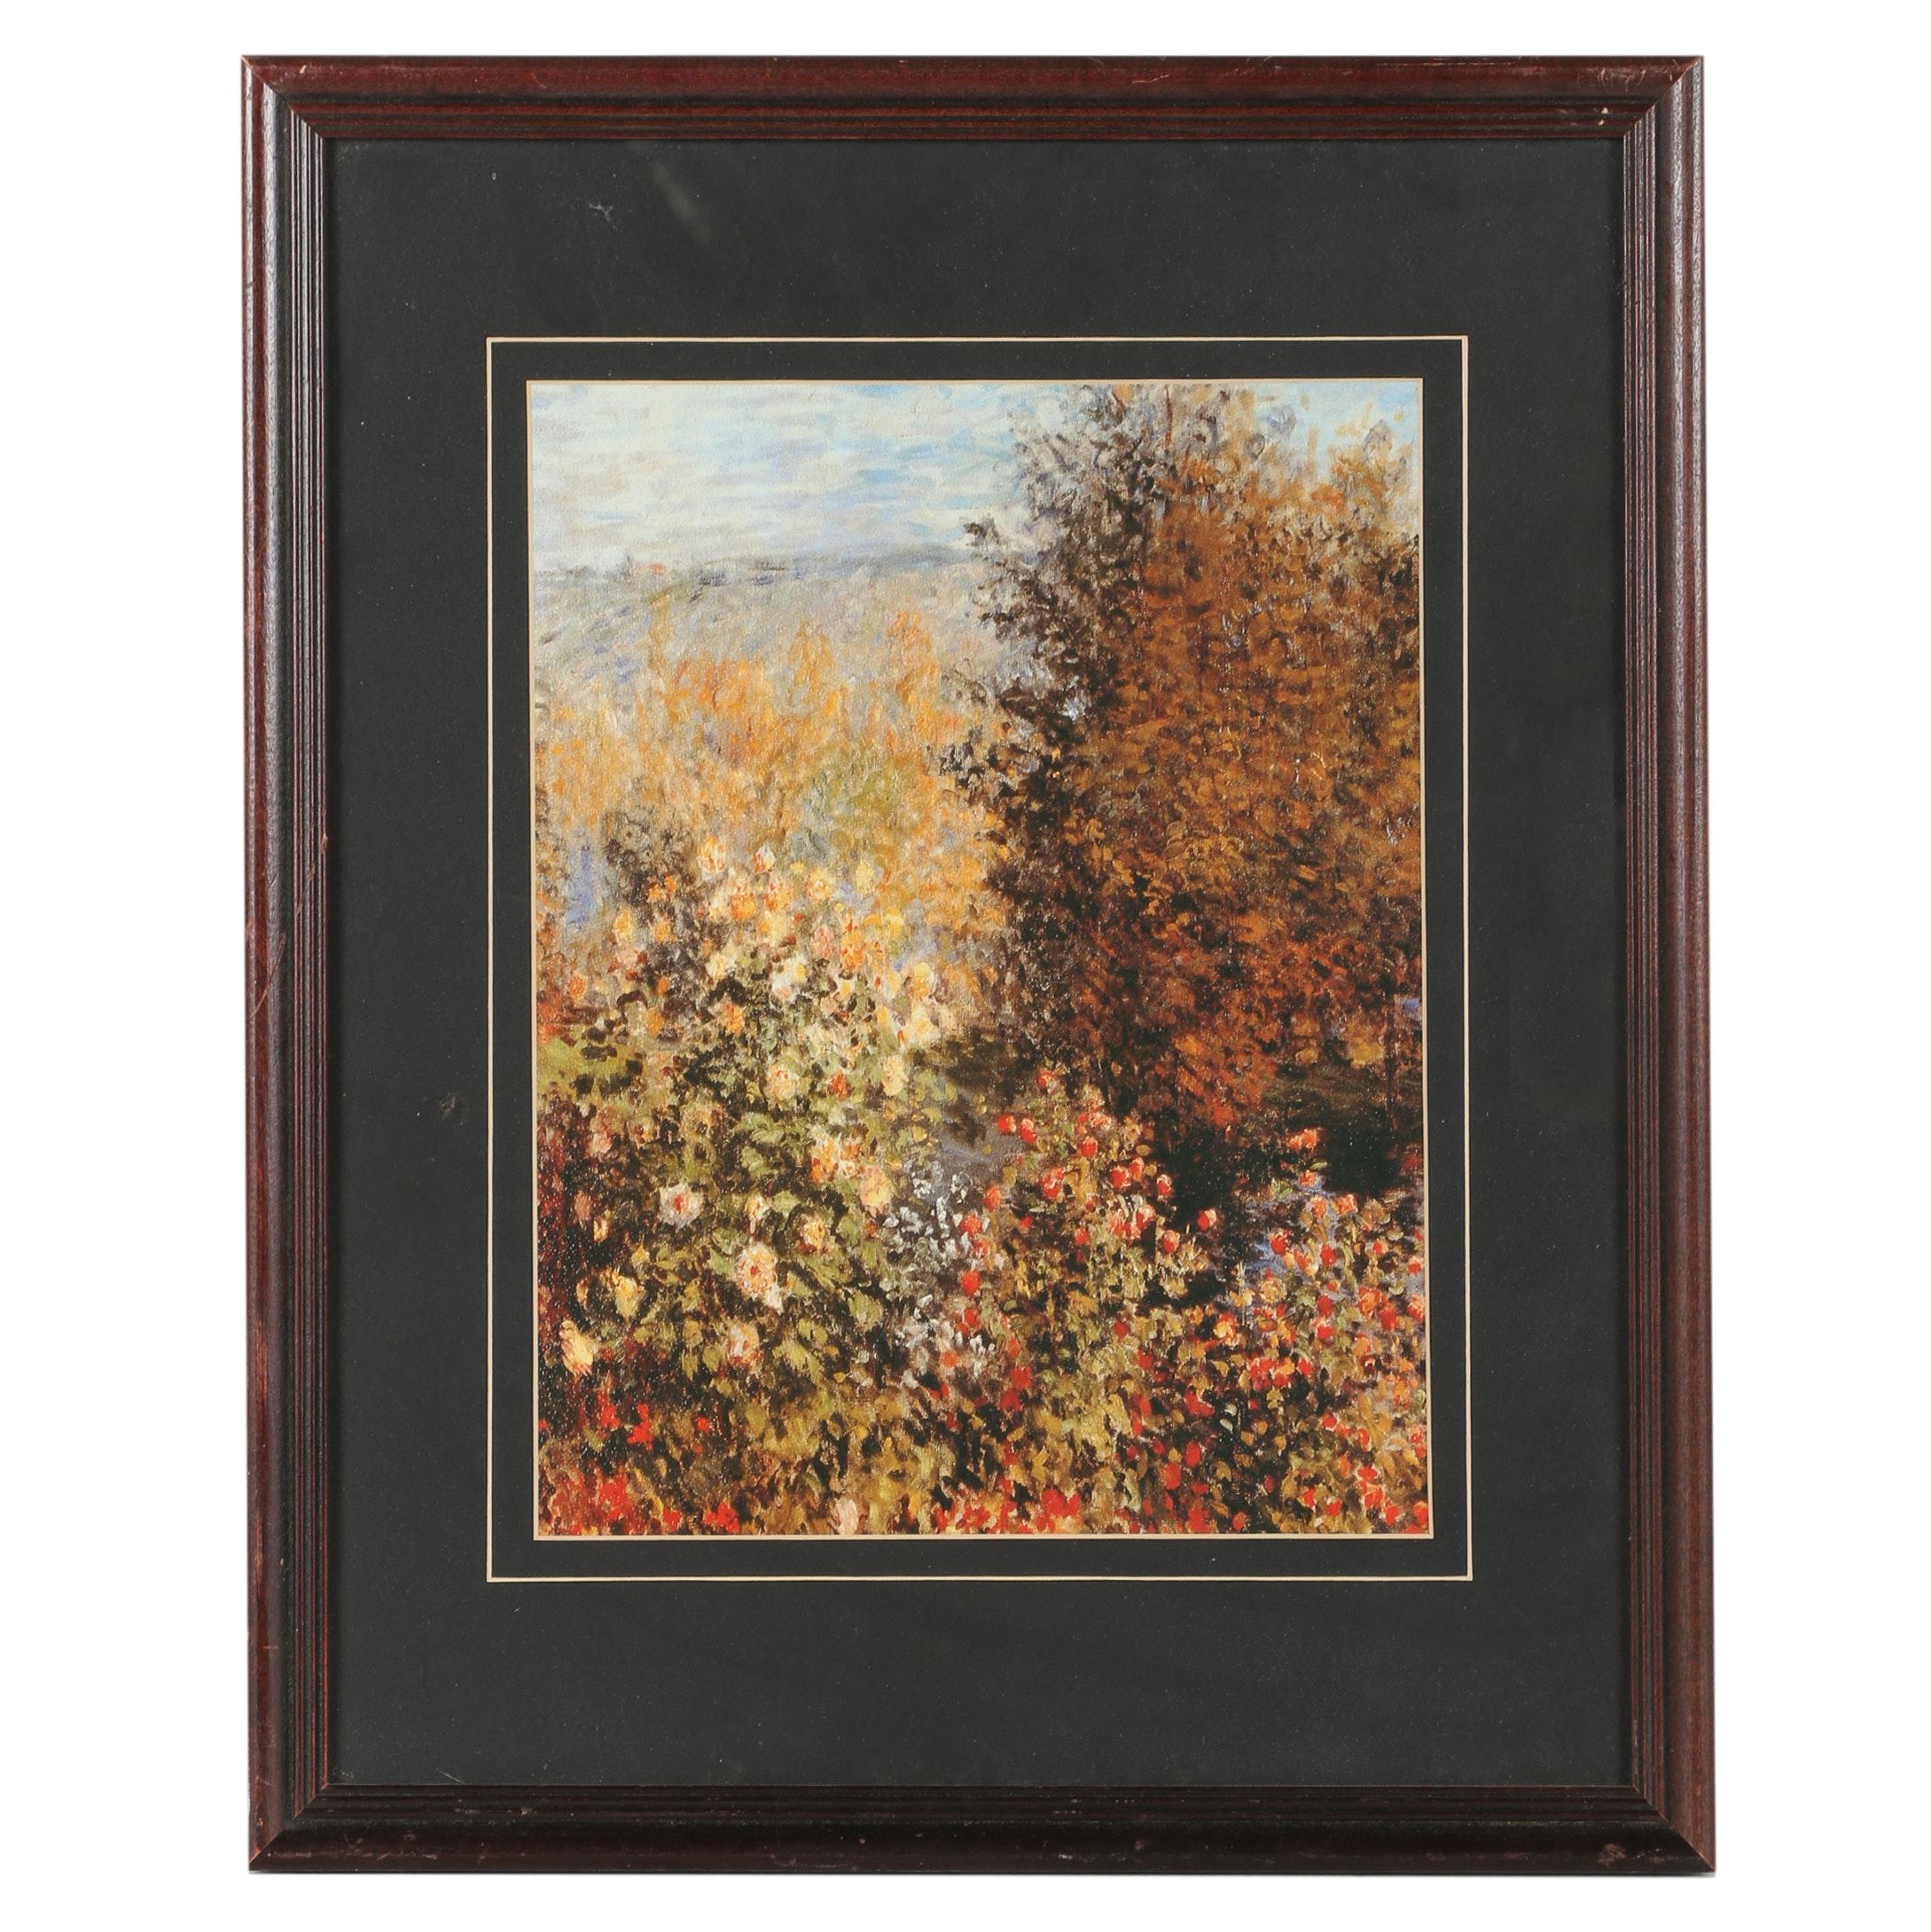 Offset Lithograph of Impressionistic Landscape